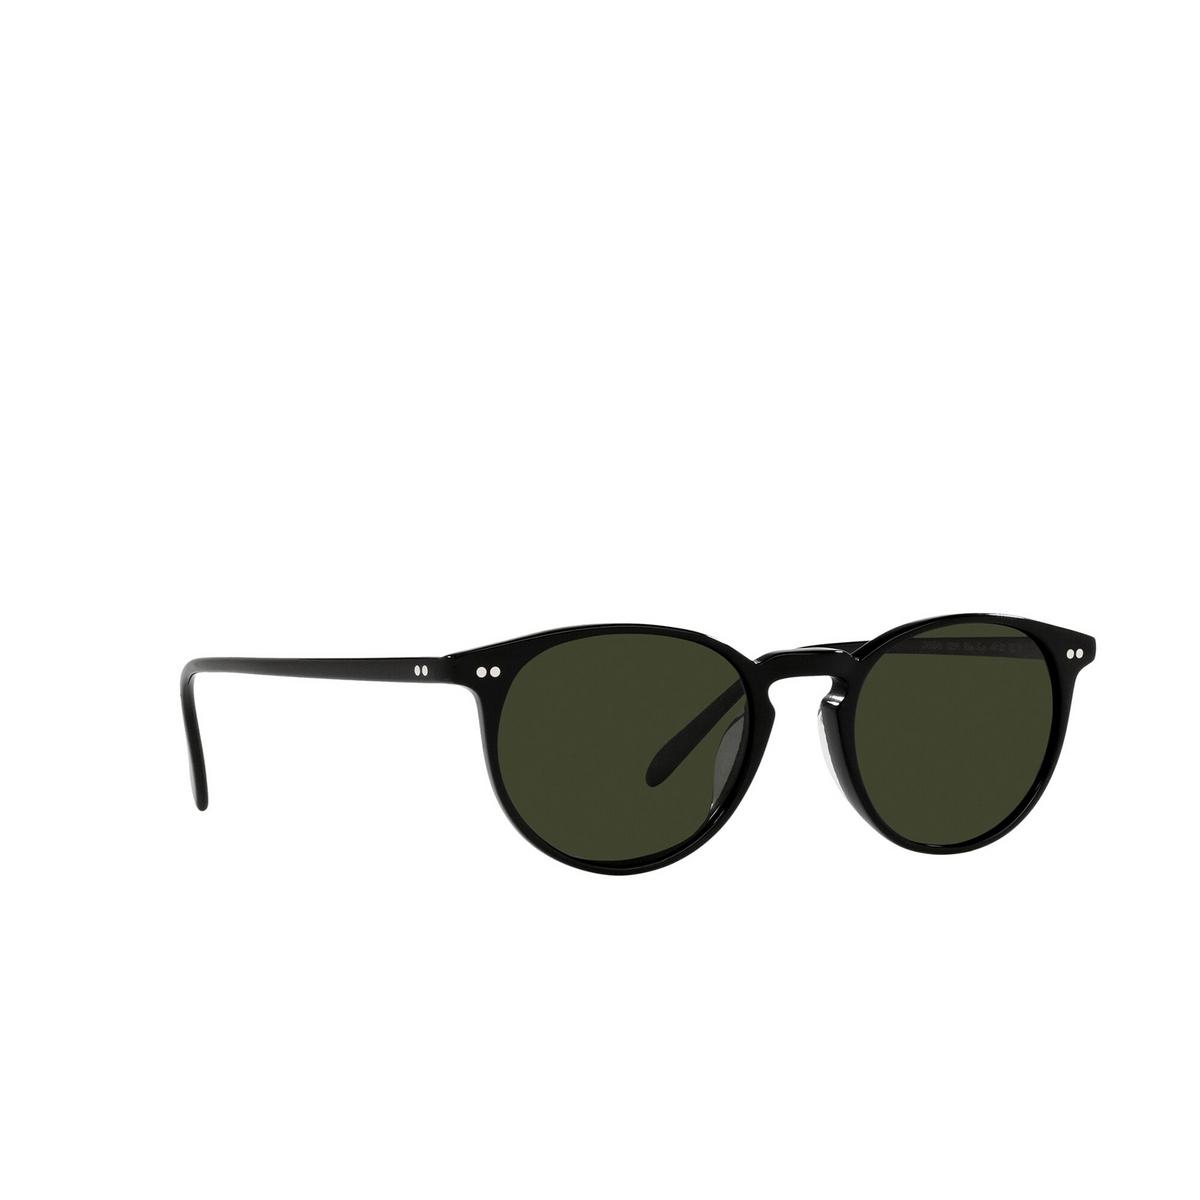 Oliver Peoples® Round Sunglasses: Riley Sun OV5004SU color Black 1005P1 - three-quarters view.